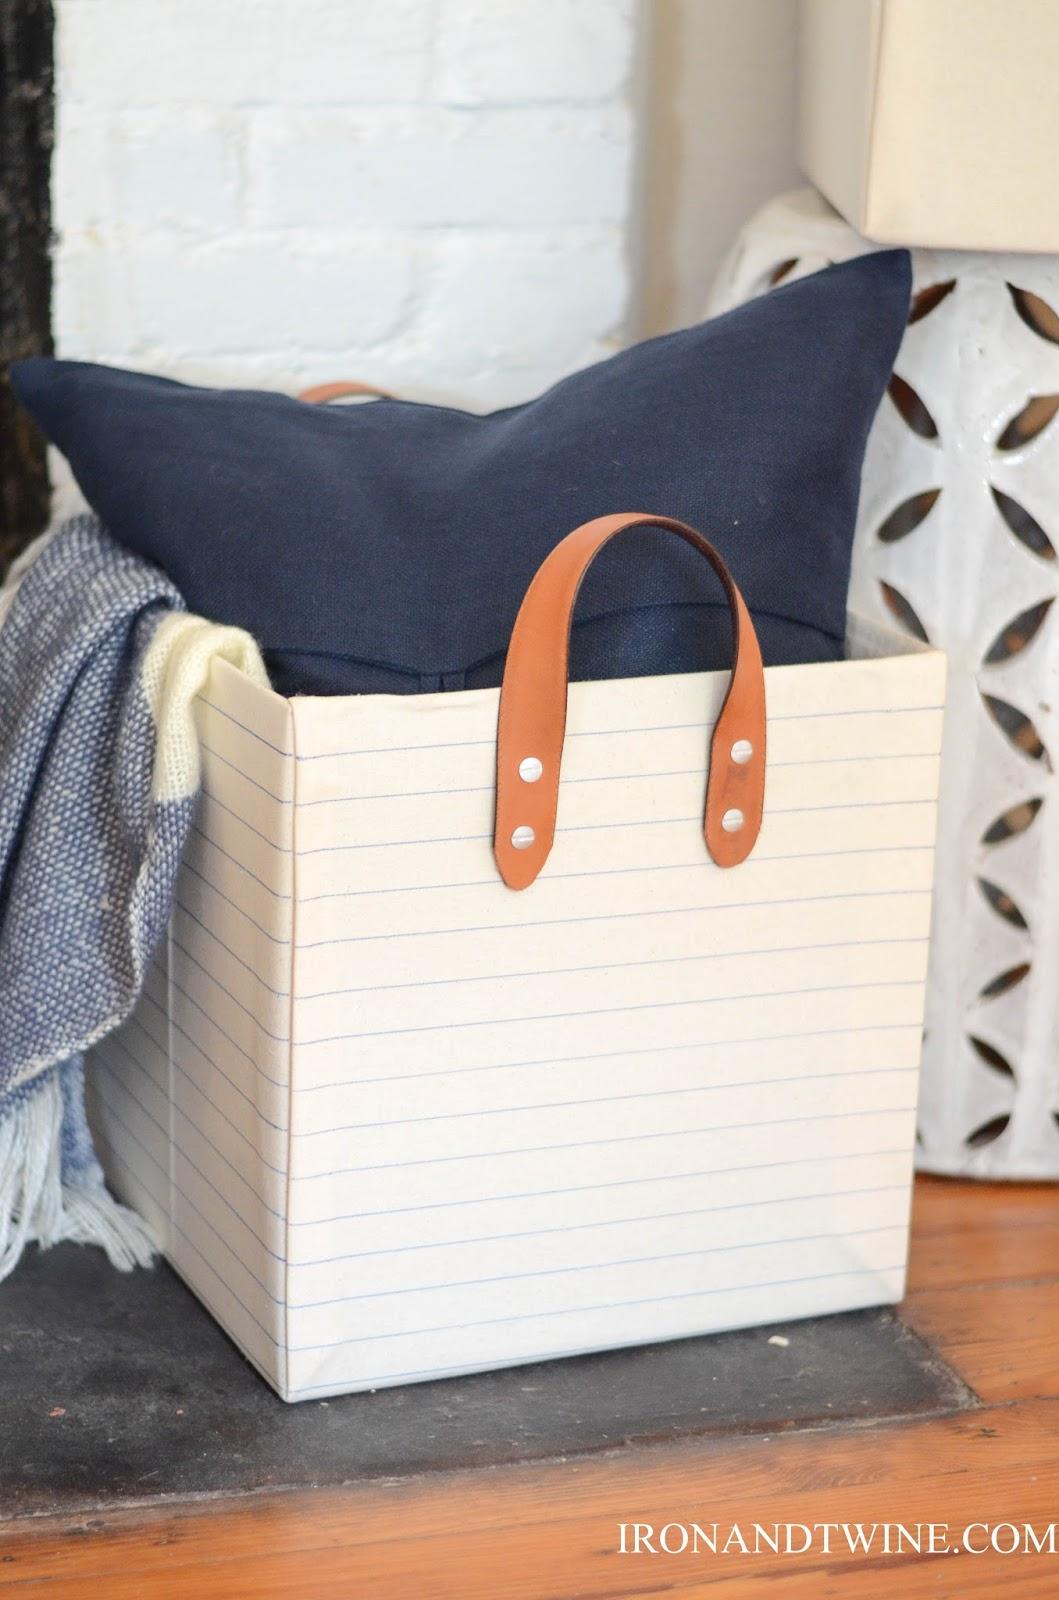 DIY+Belt+Handled+Box,+DIY+fabric+covered+box,+Iron+and+Twine+(5).jpg